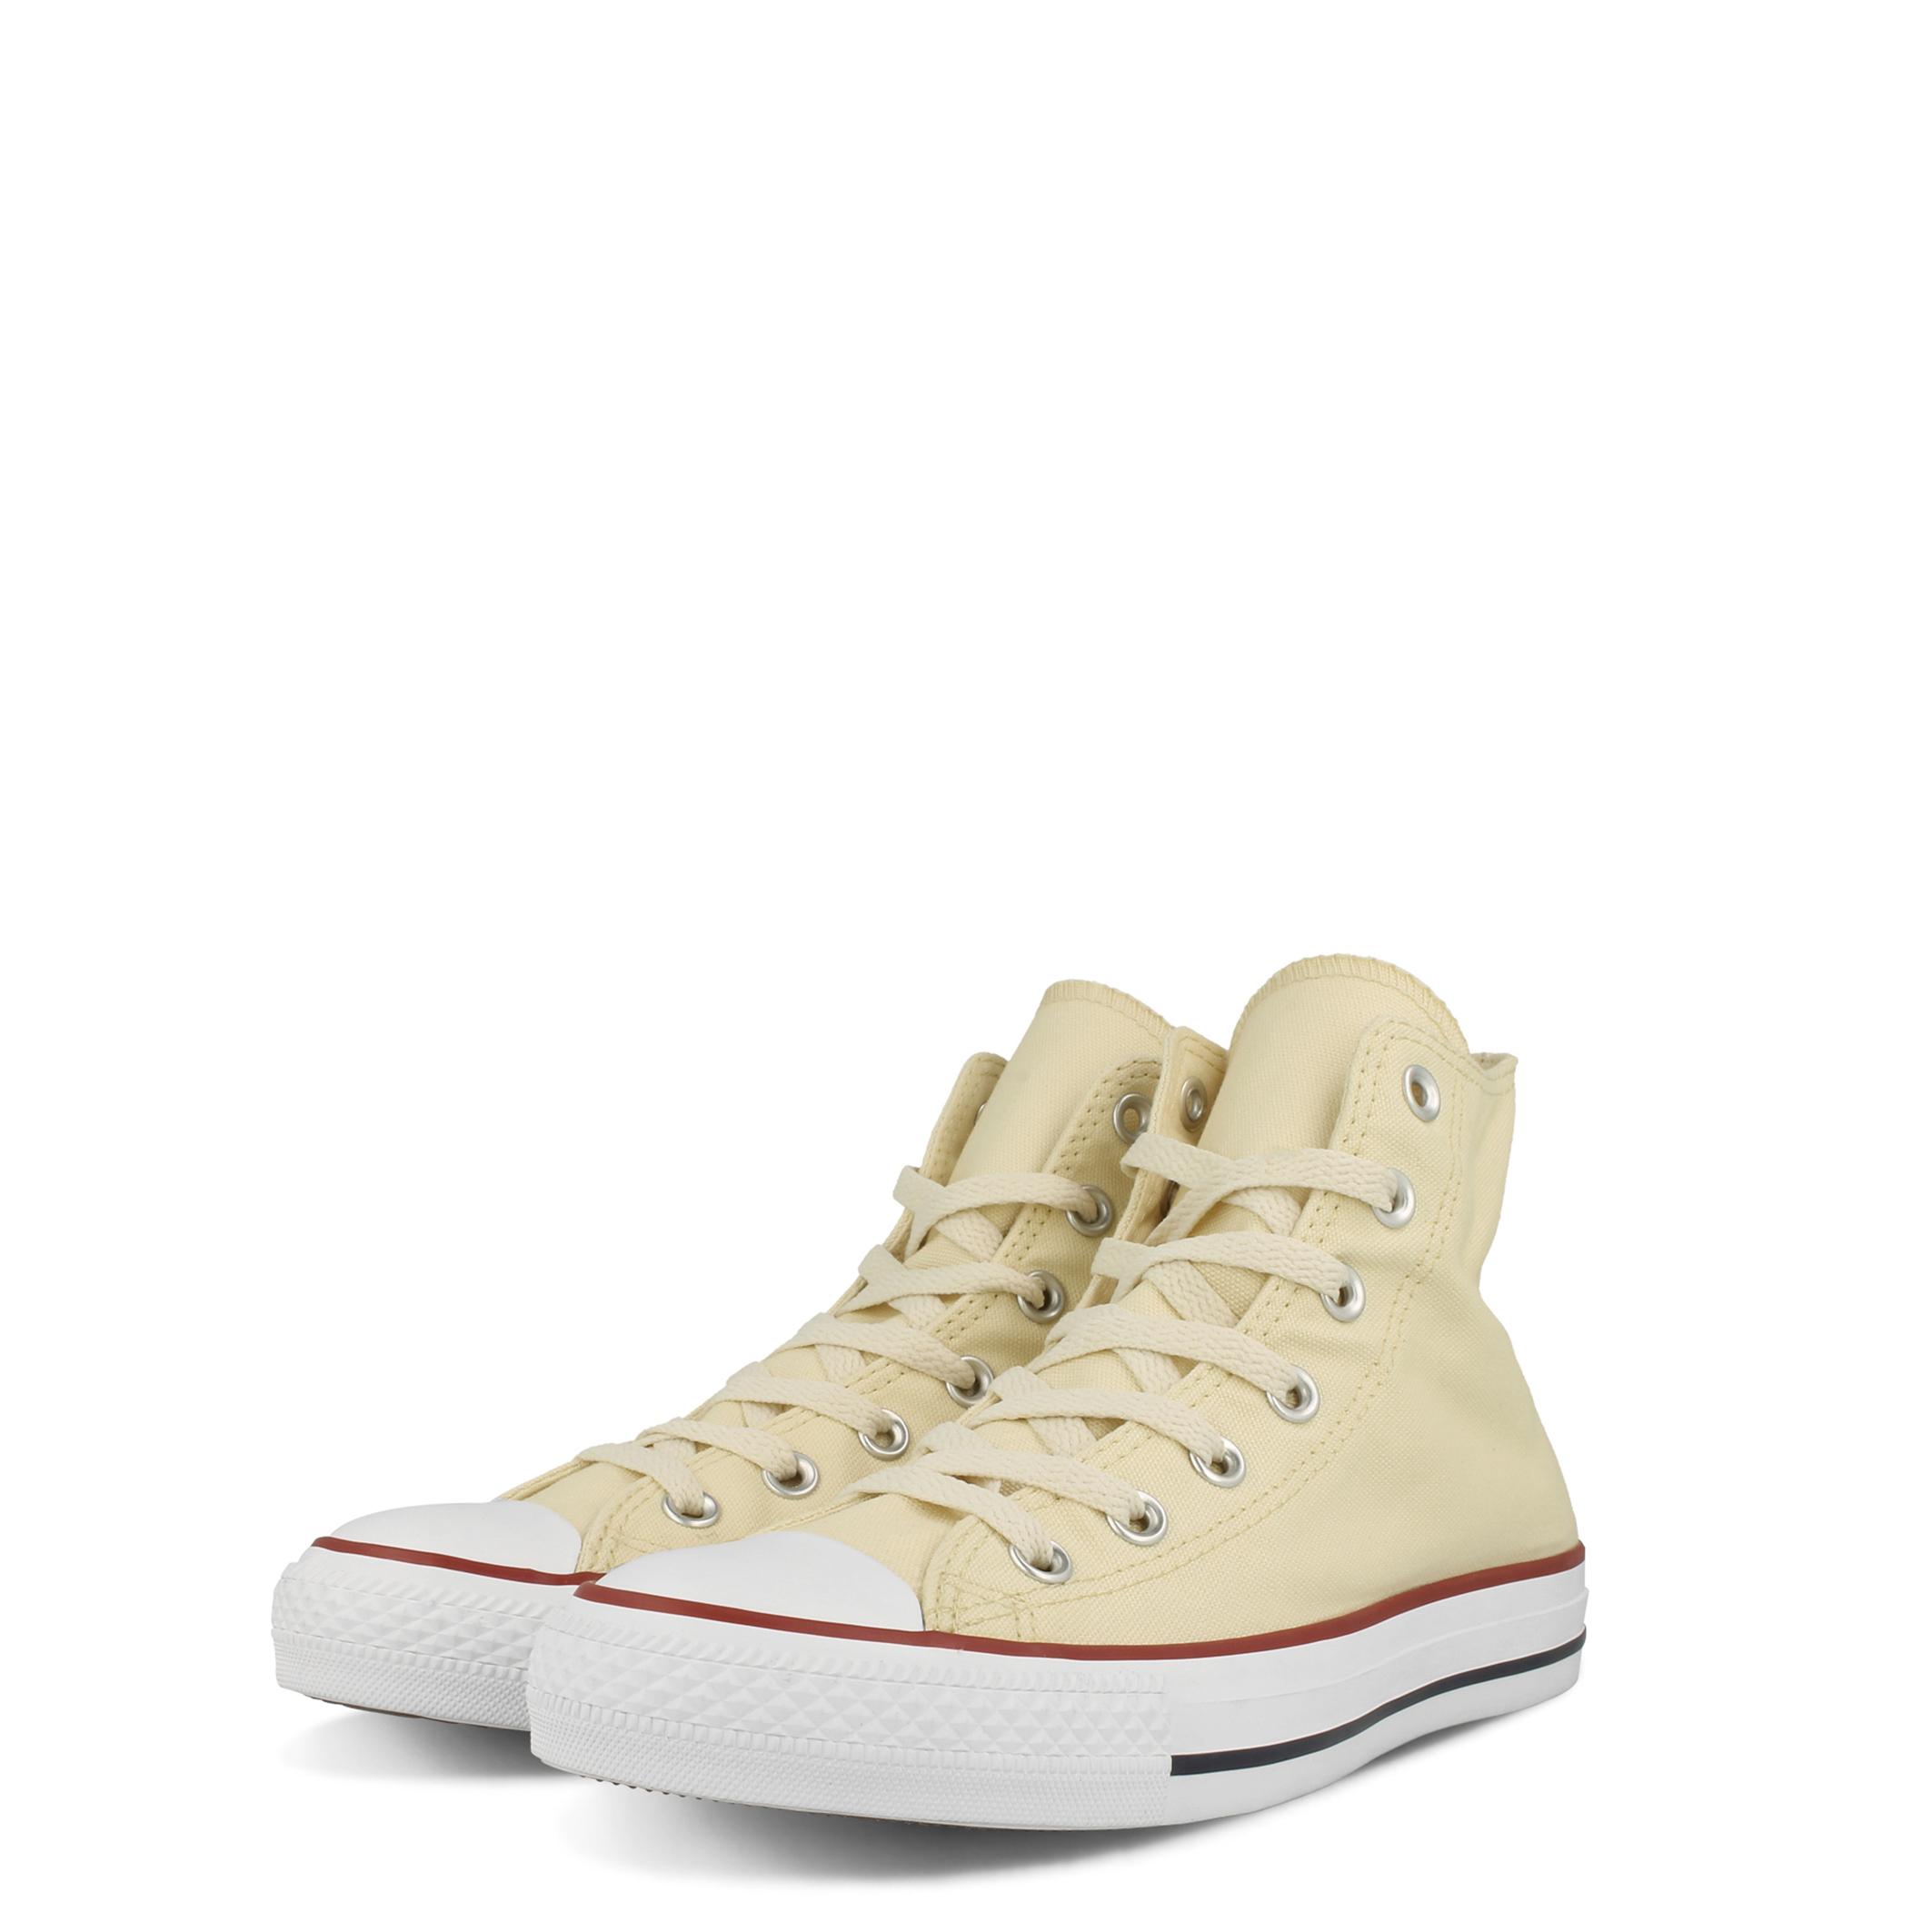 Baskets / Sport  Converse M9162 white